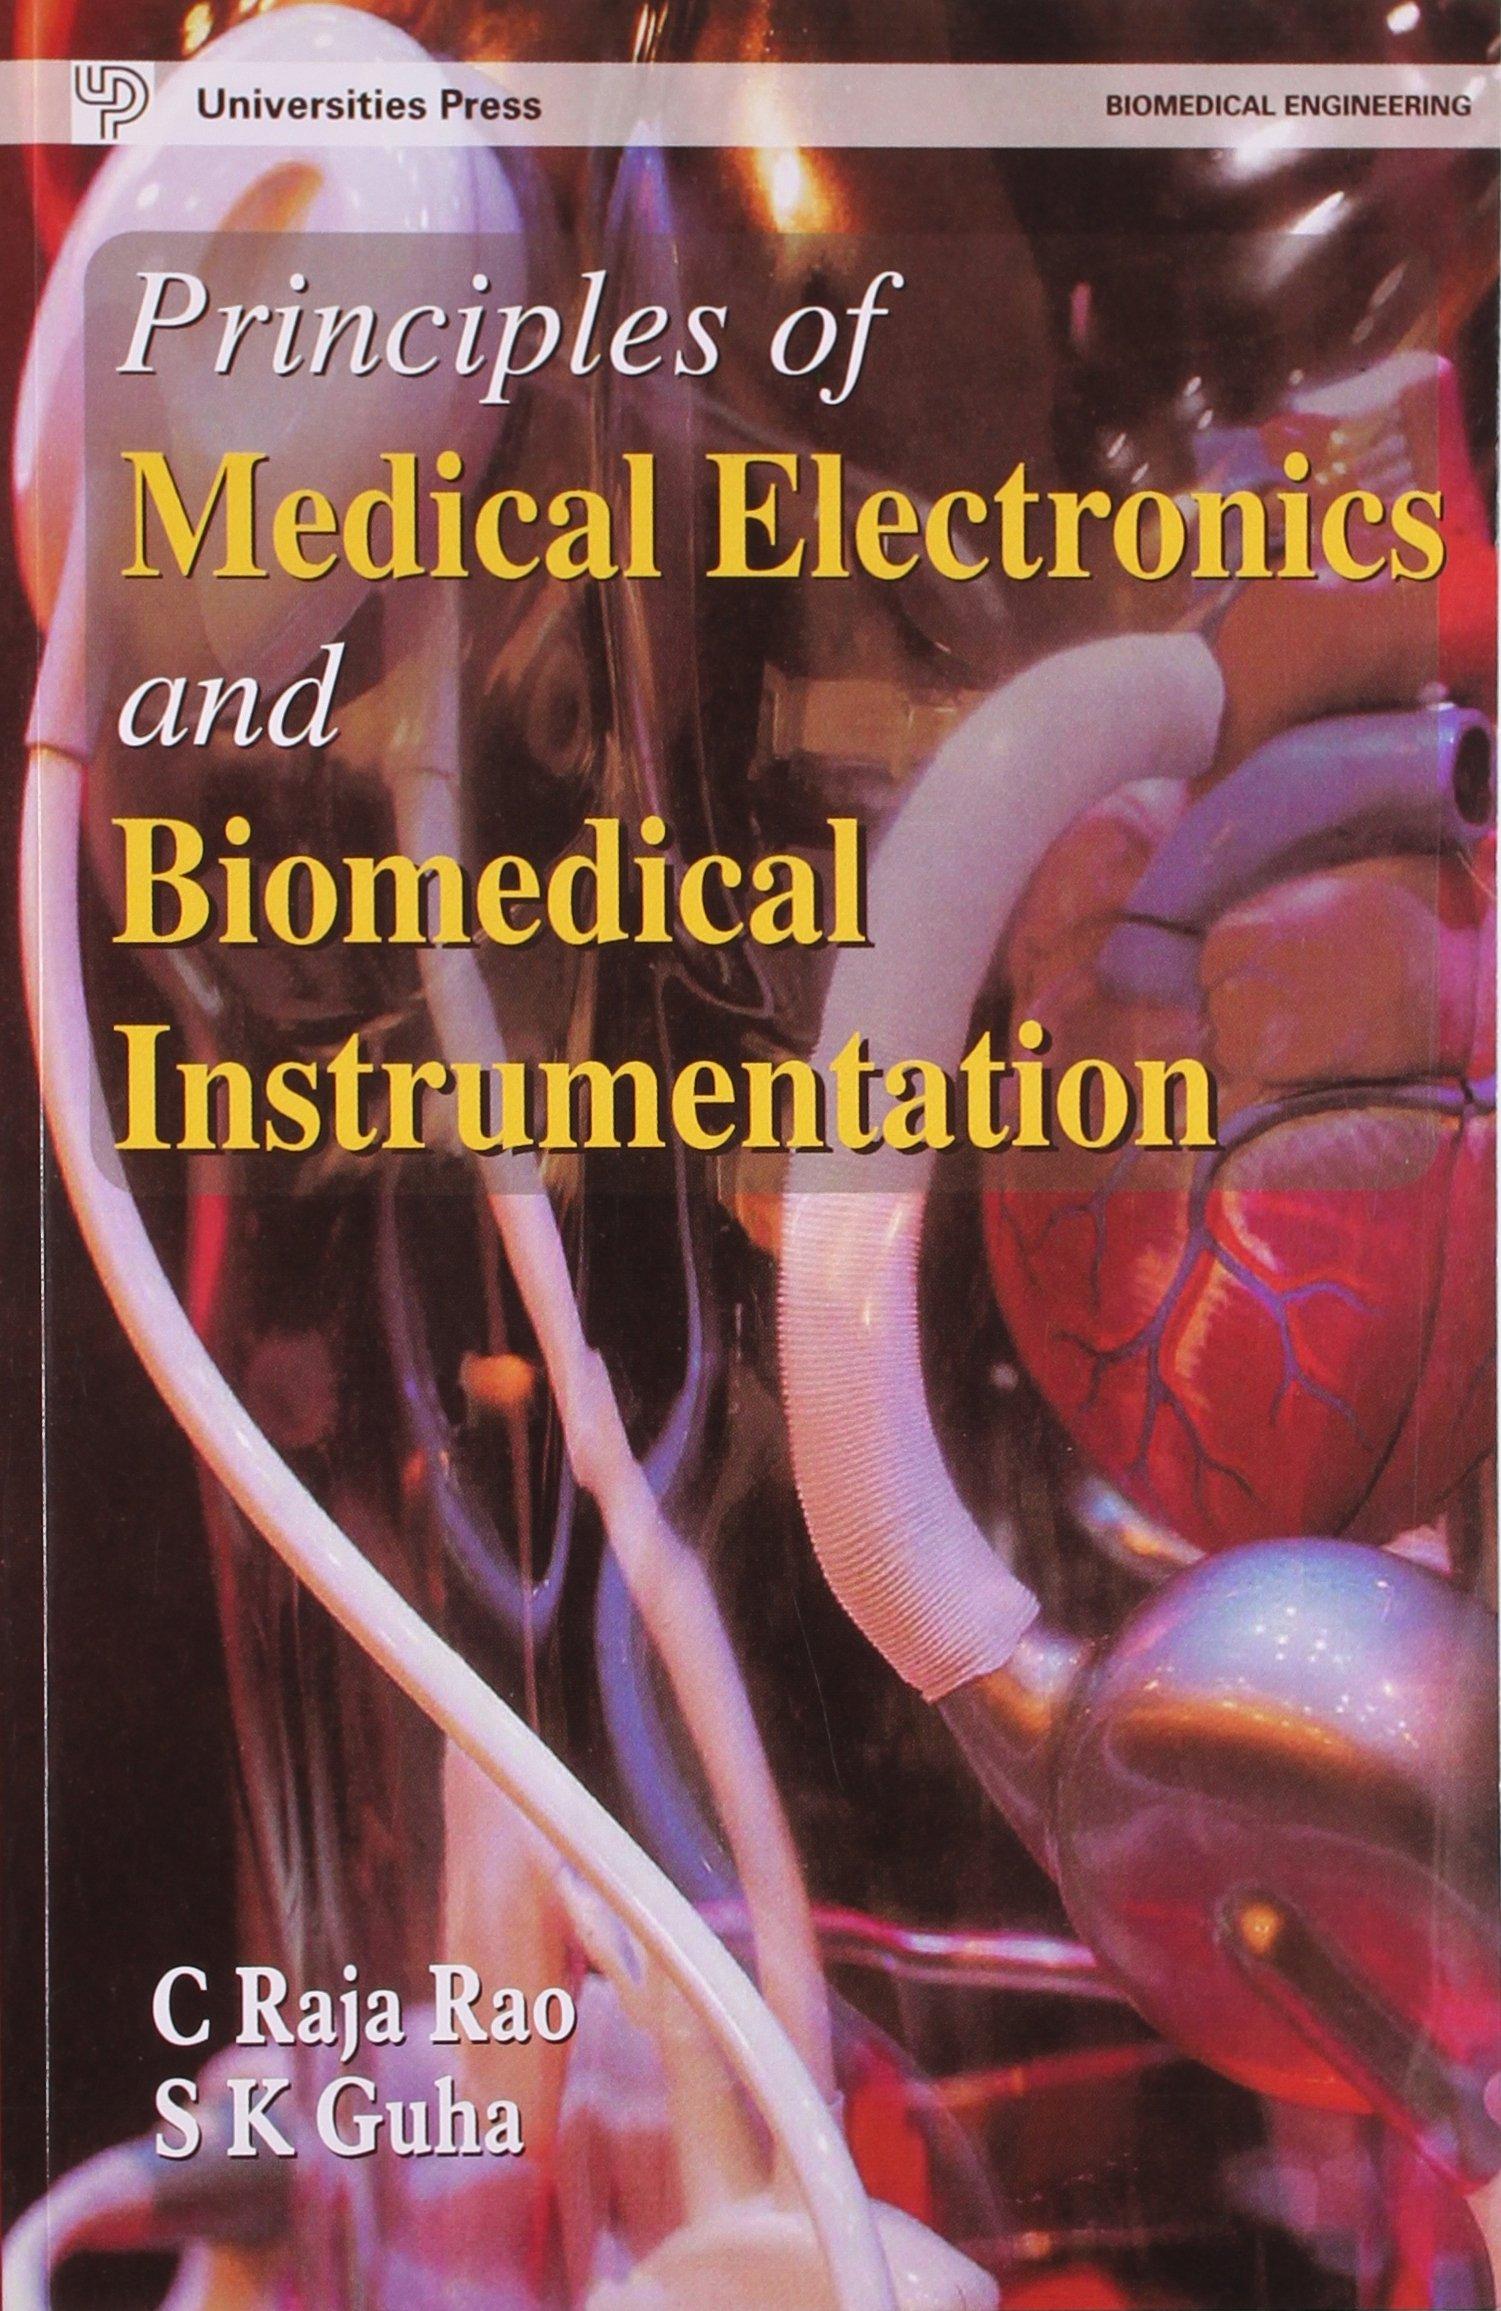 principles of medical electronics and biomedical instrumentation free download